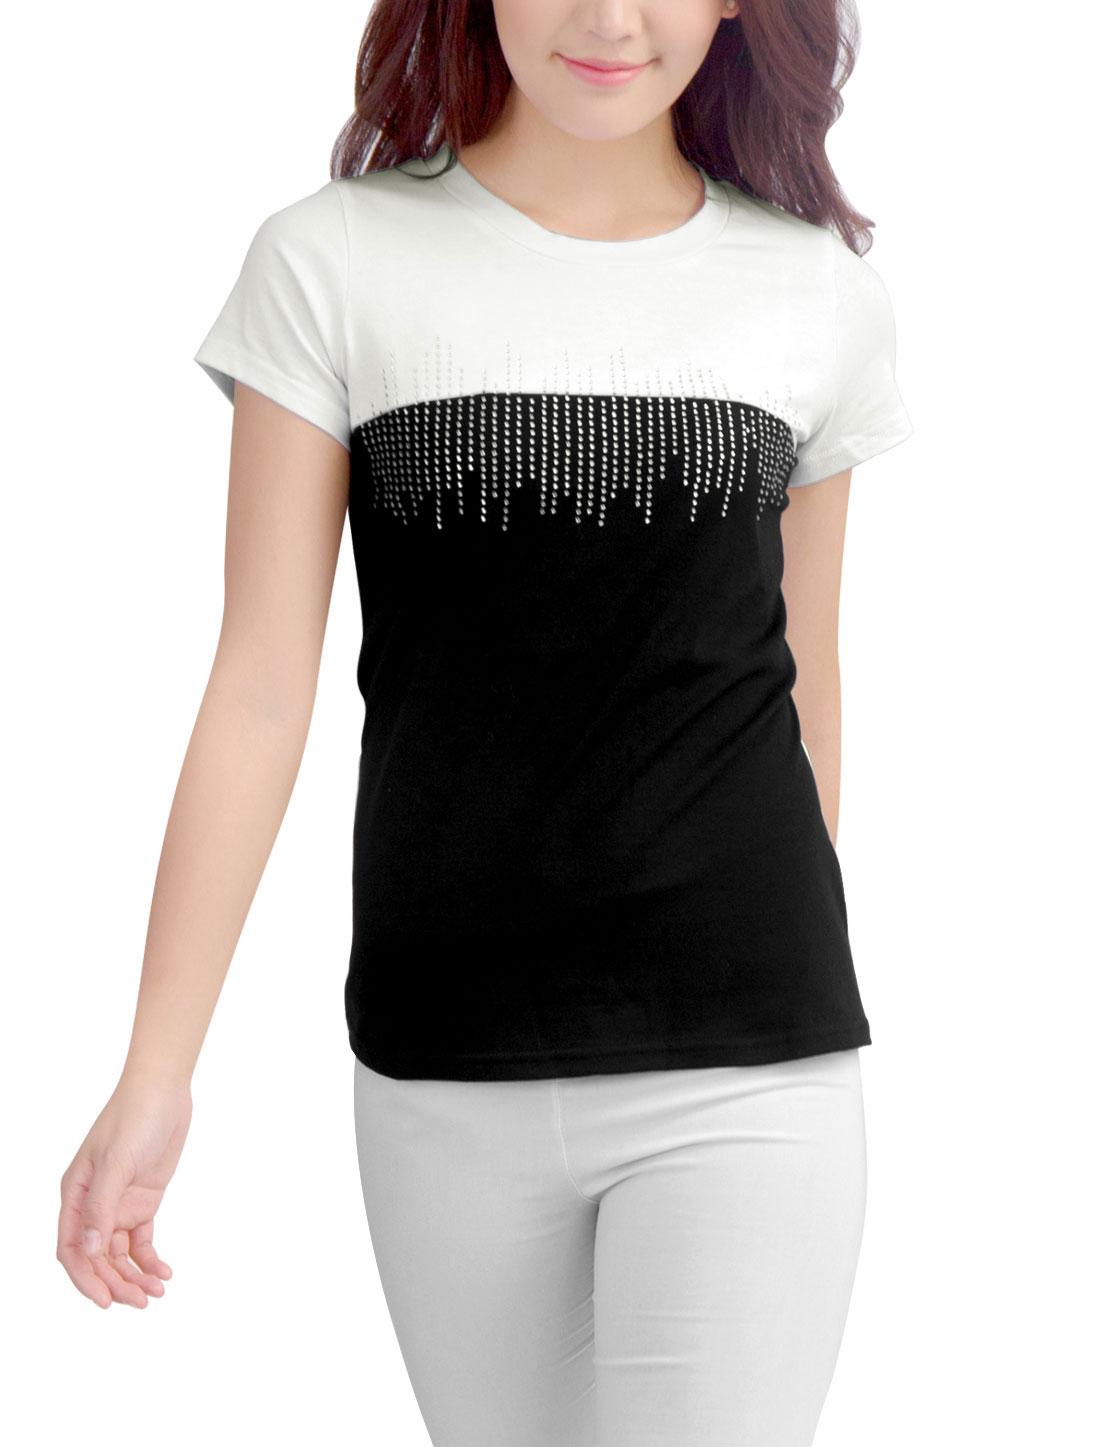 Women NEW Fashion Color Blocking Black White Casual Top Shirt XL